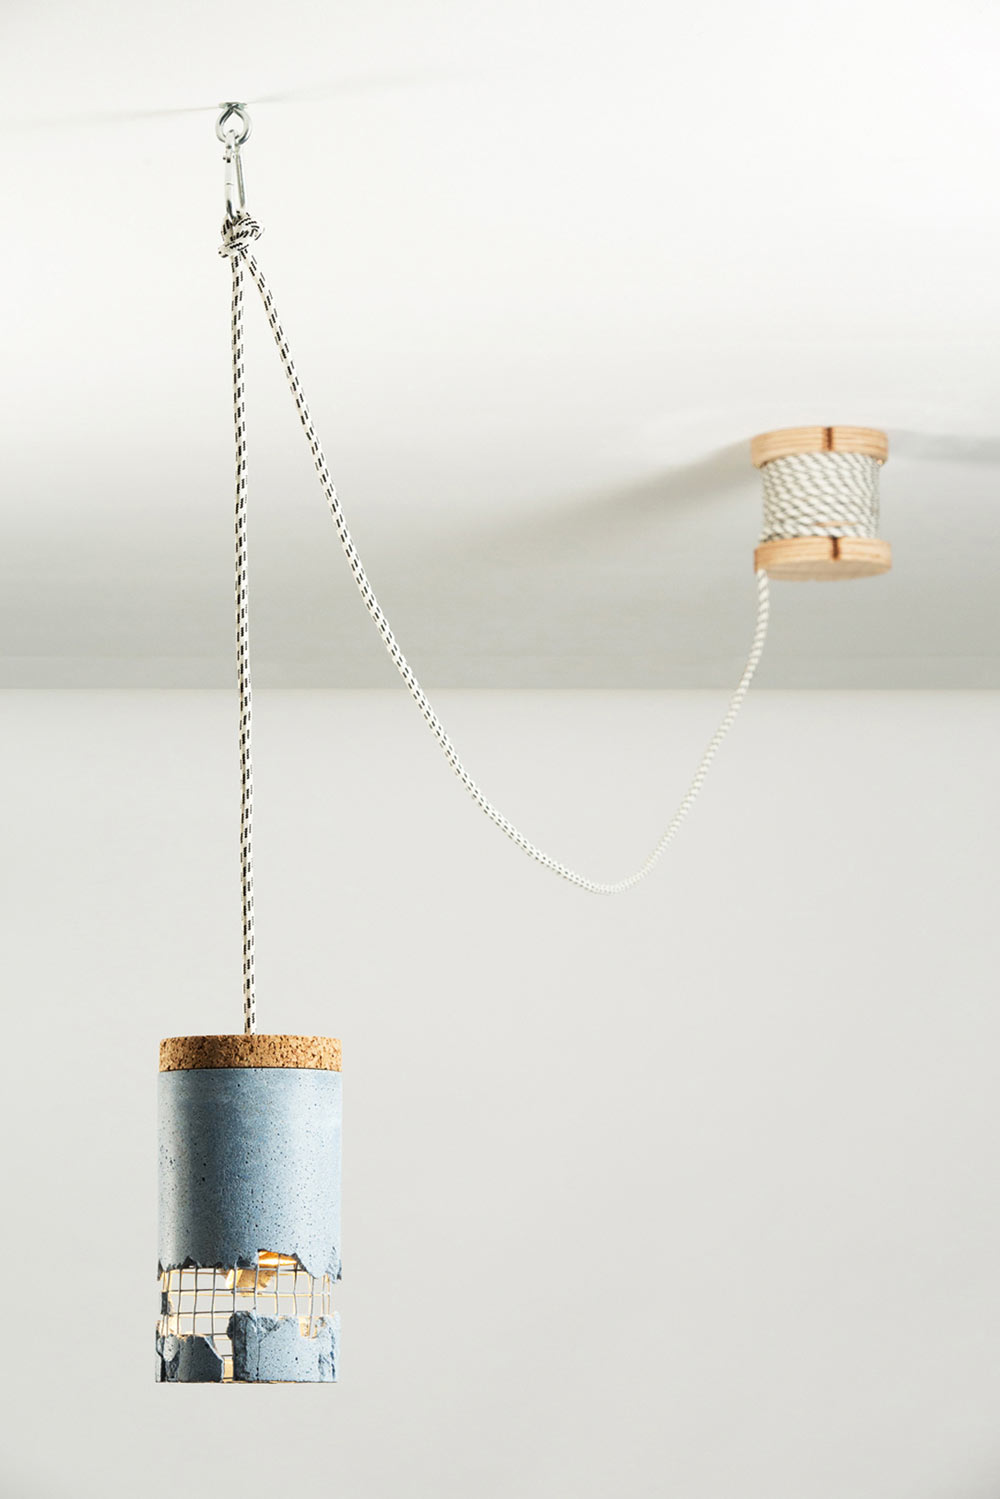 slash-lamp-concrete-lighting-ceiling